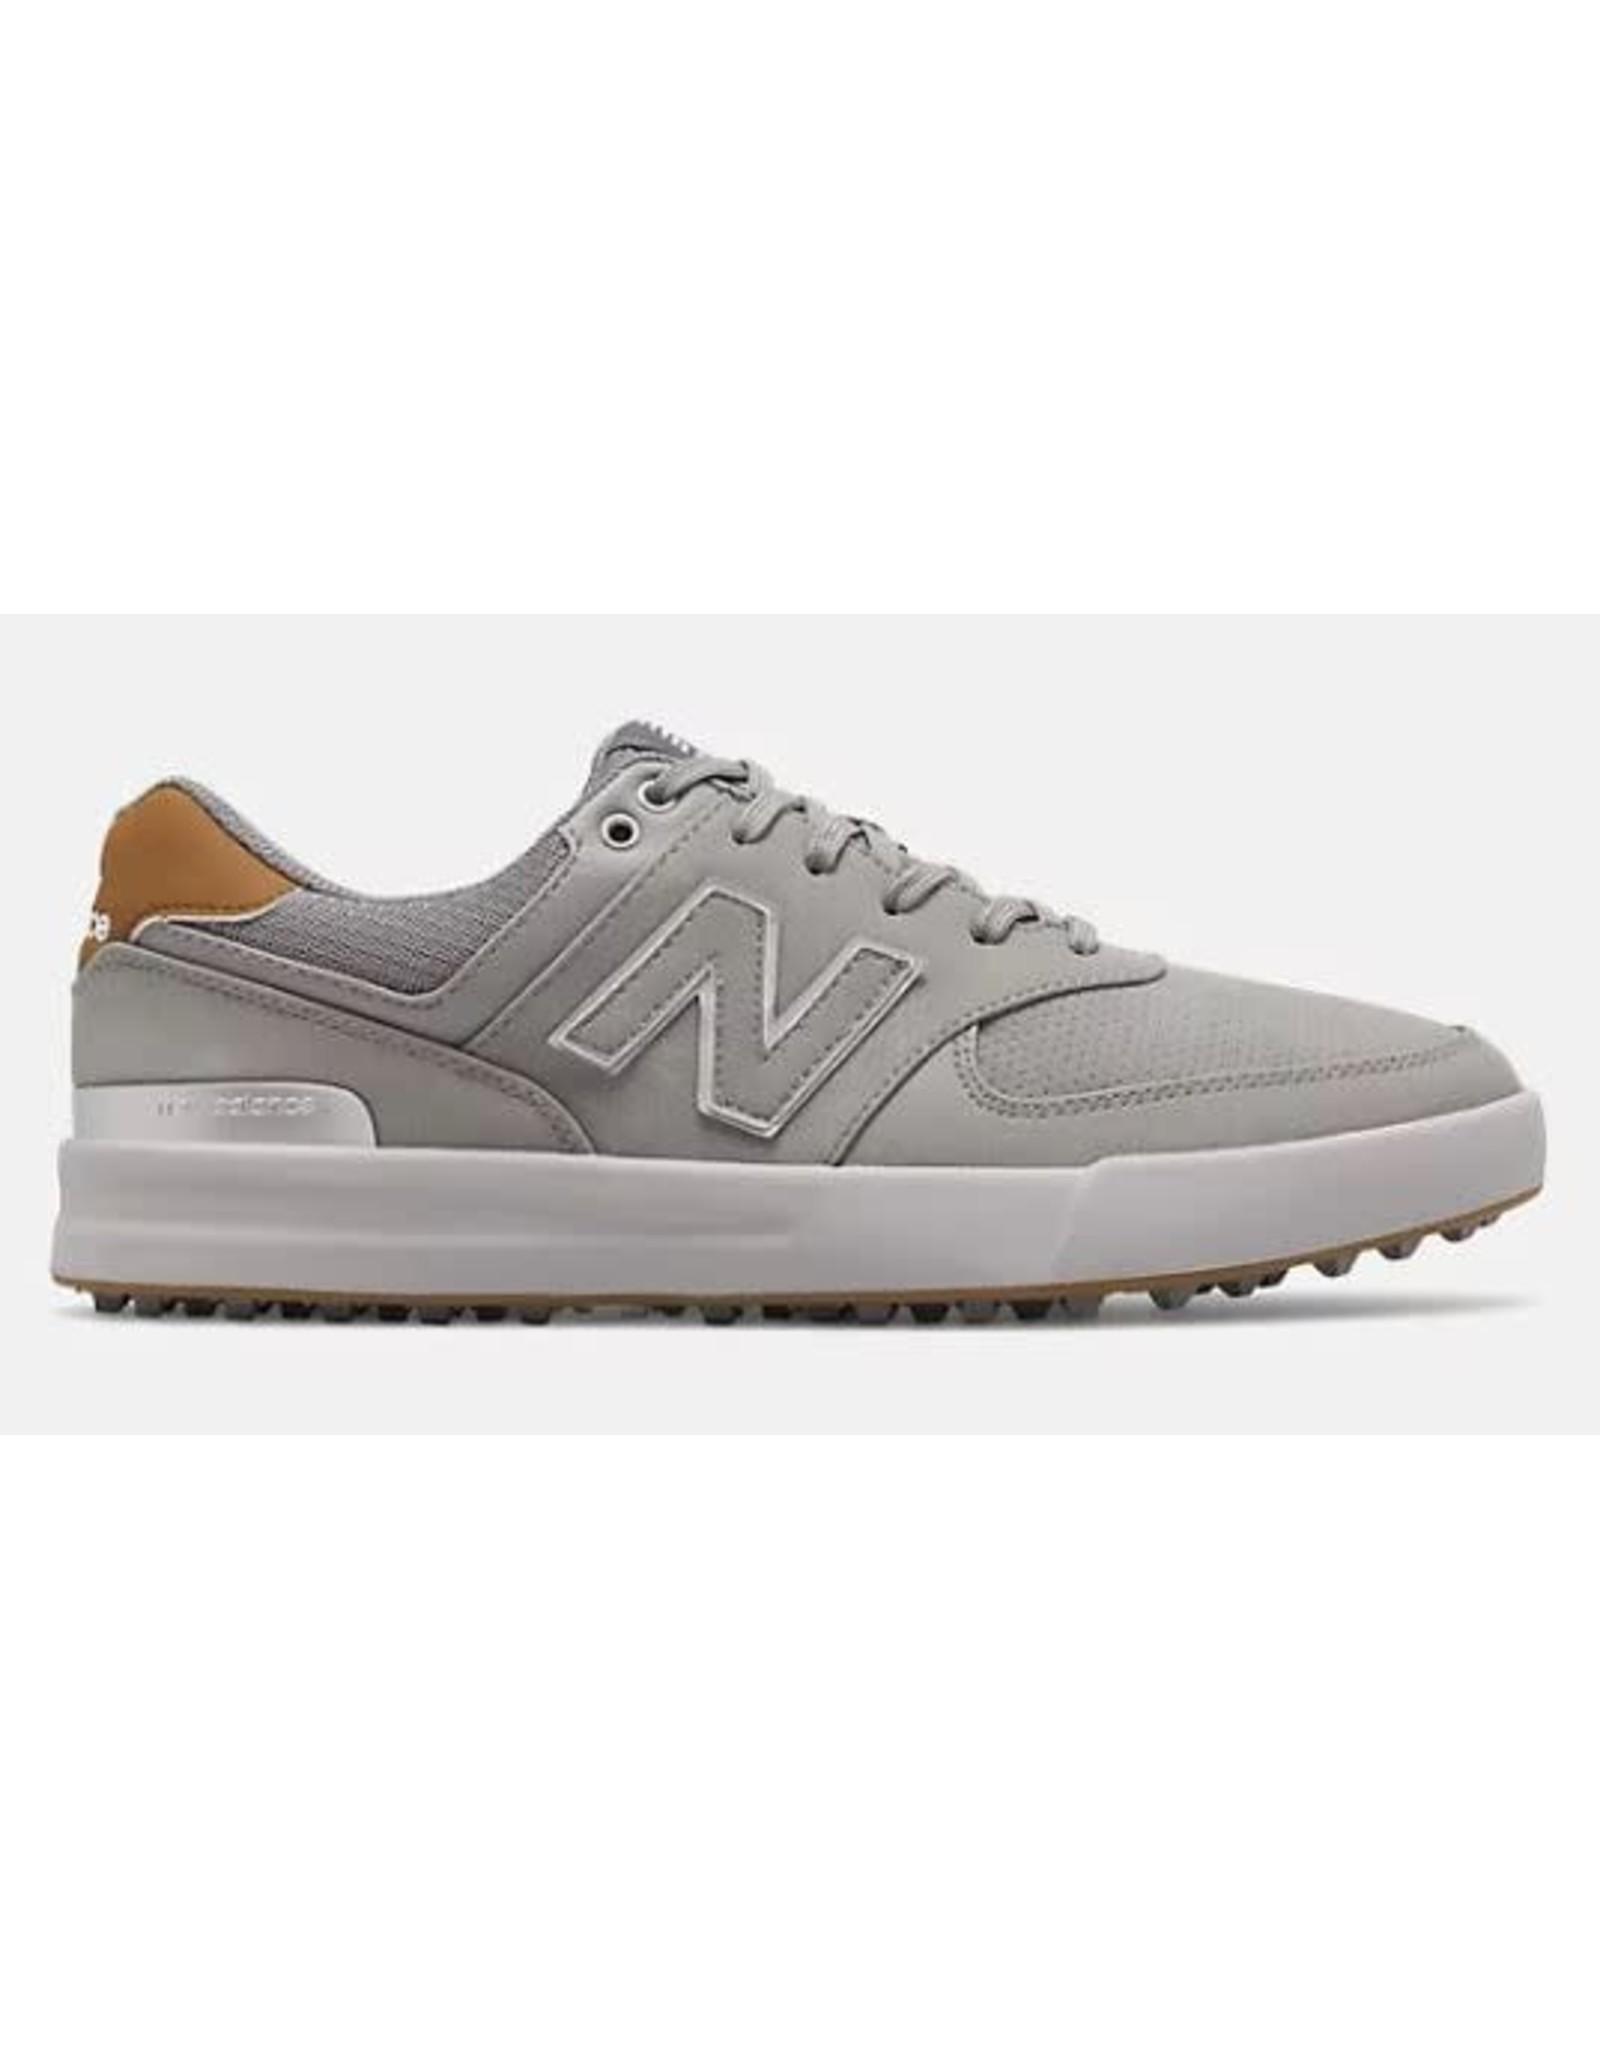 New Balance 574 Greens Shoe